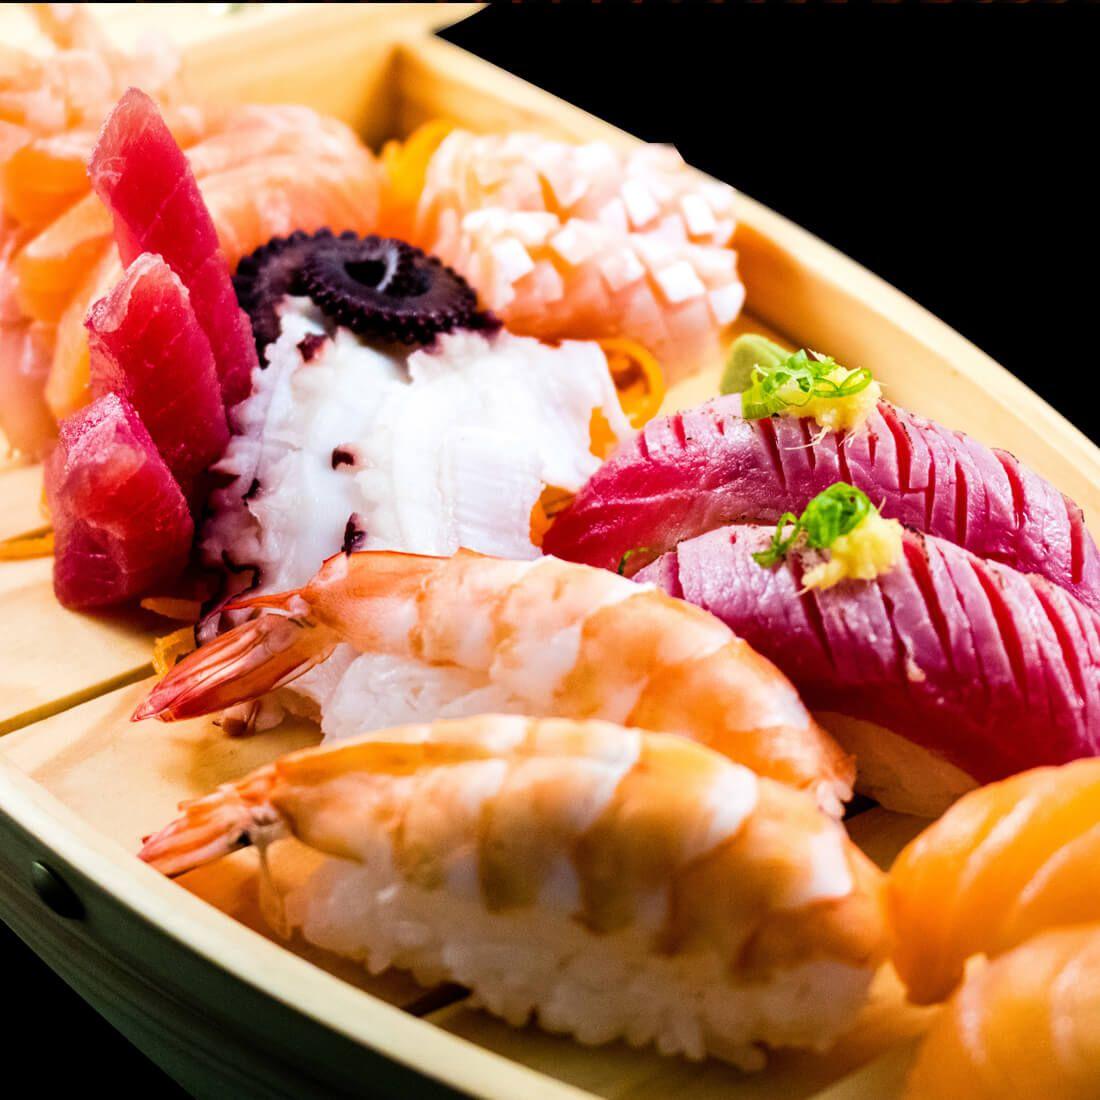 SAKAE SUSHI BAR Restaurante - Reserva y Pide Delivery o Take Out en restaurantes de Comida NIKKEI / JAPONESA - SANTIAGO DE SURCO - MESA 24/7 | LIMA - Perú